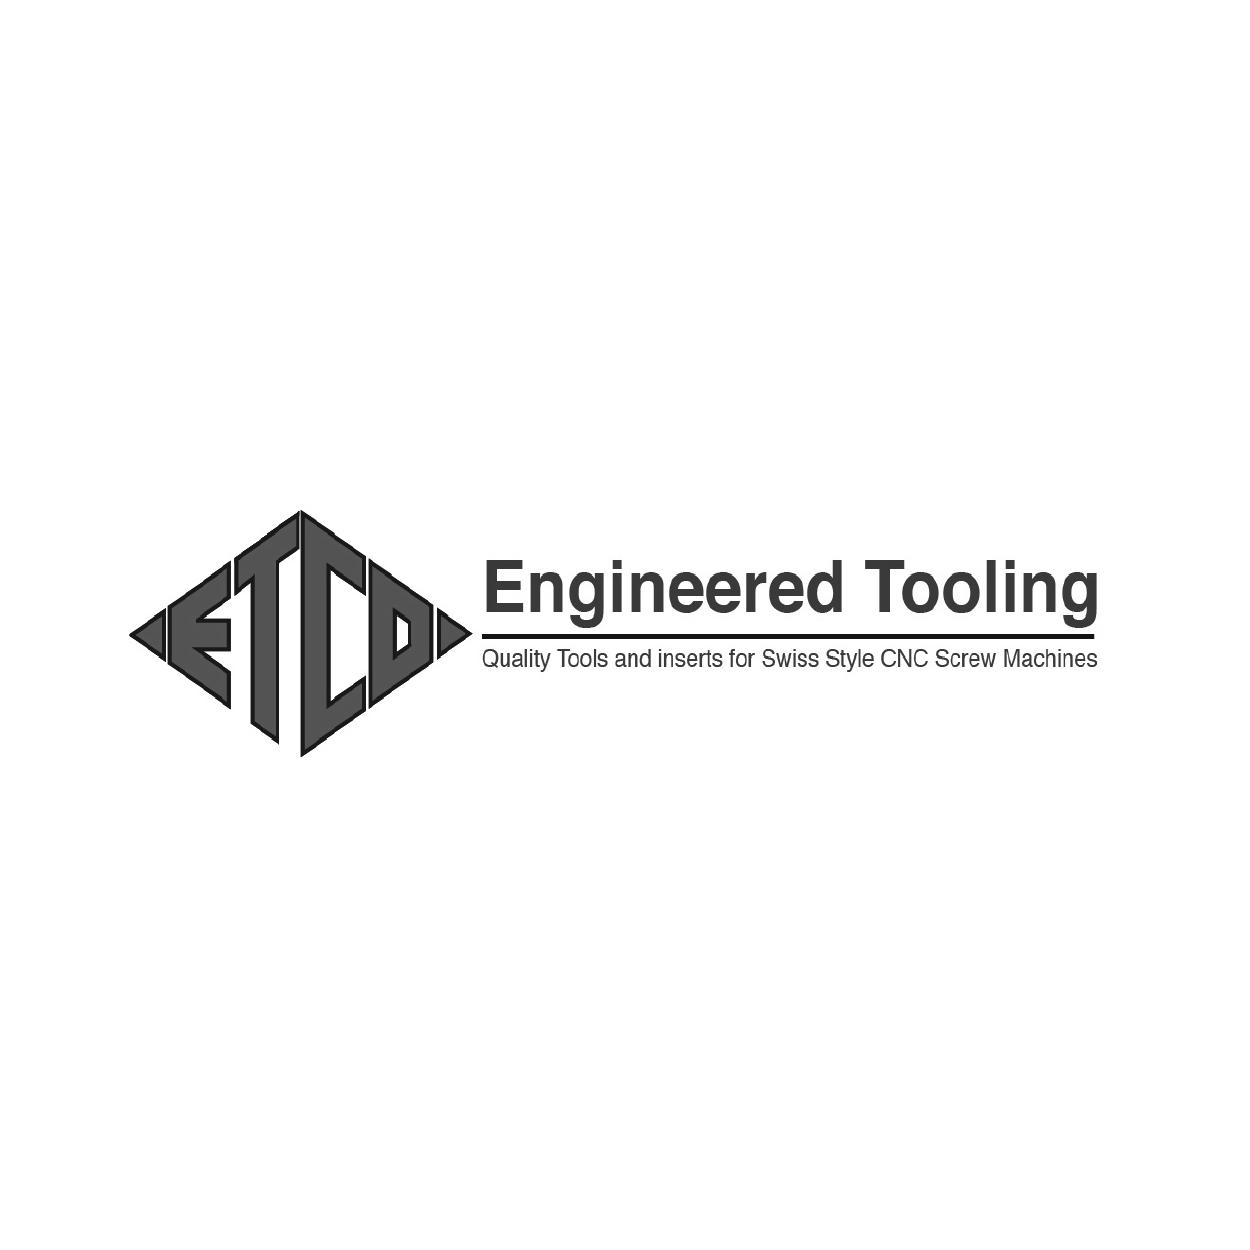 Engineered Tooling